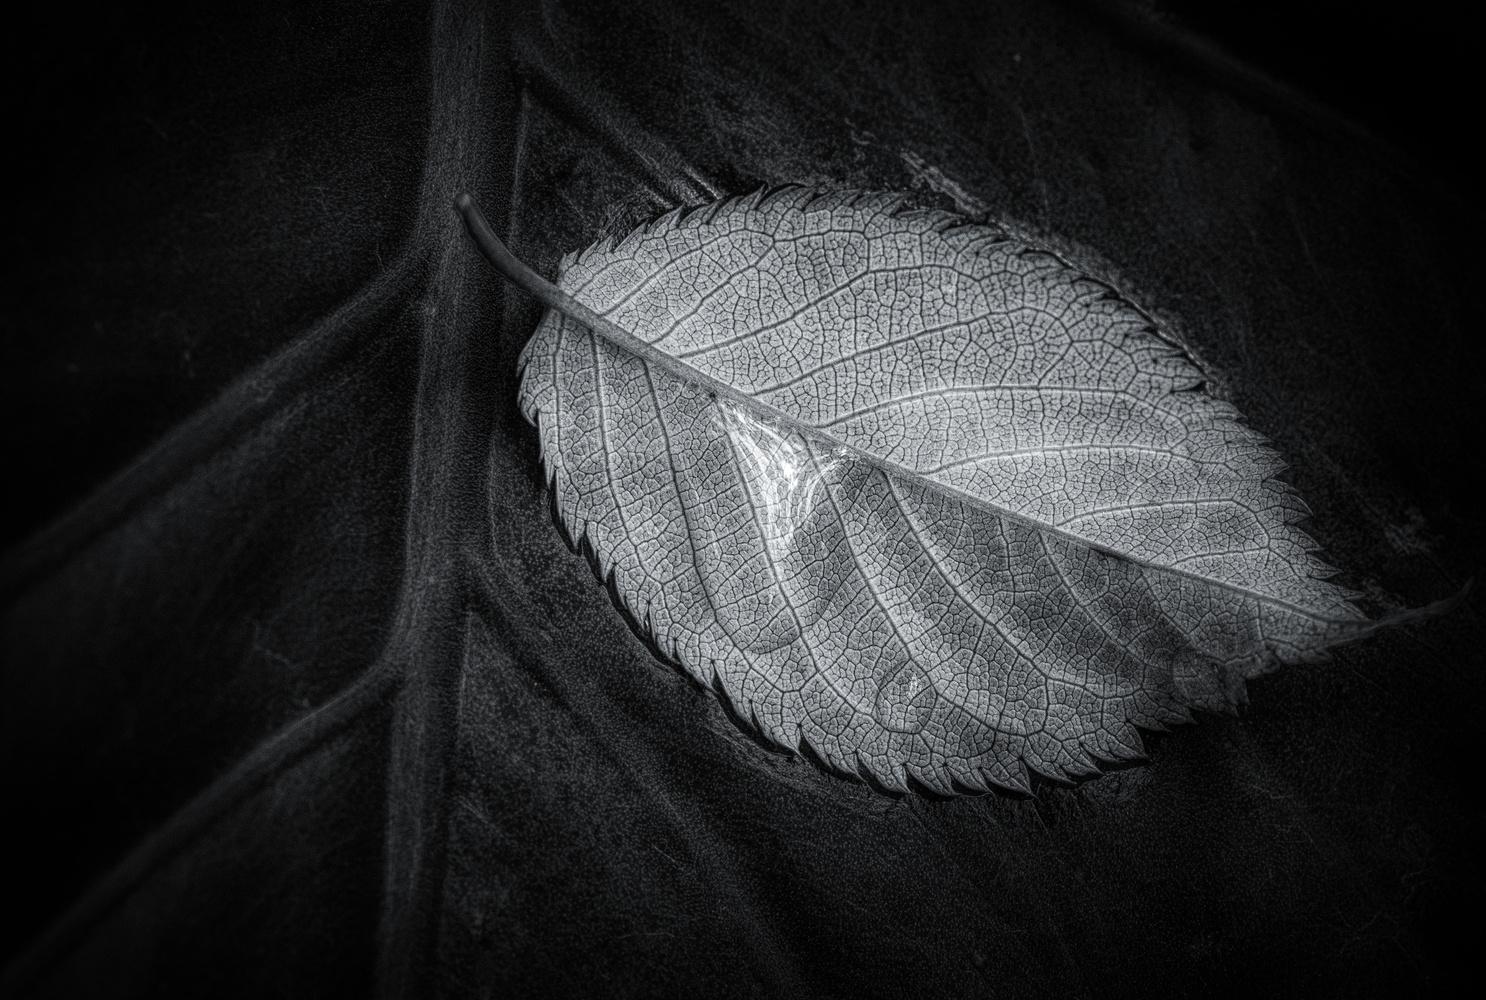 Leaf on Leaf by John Ellingson